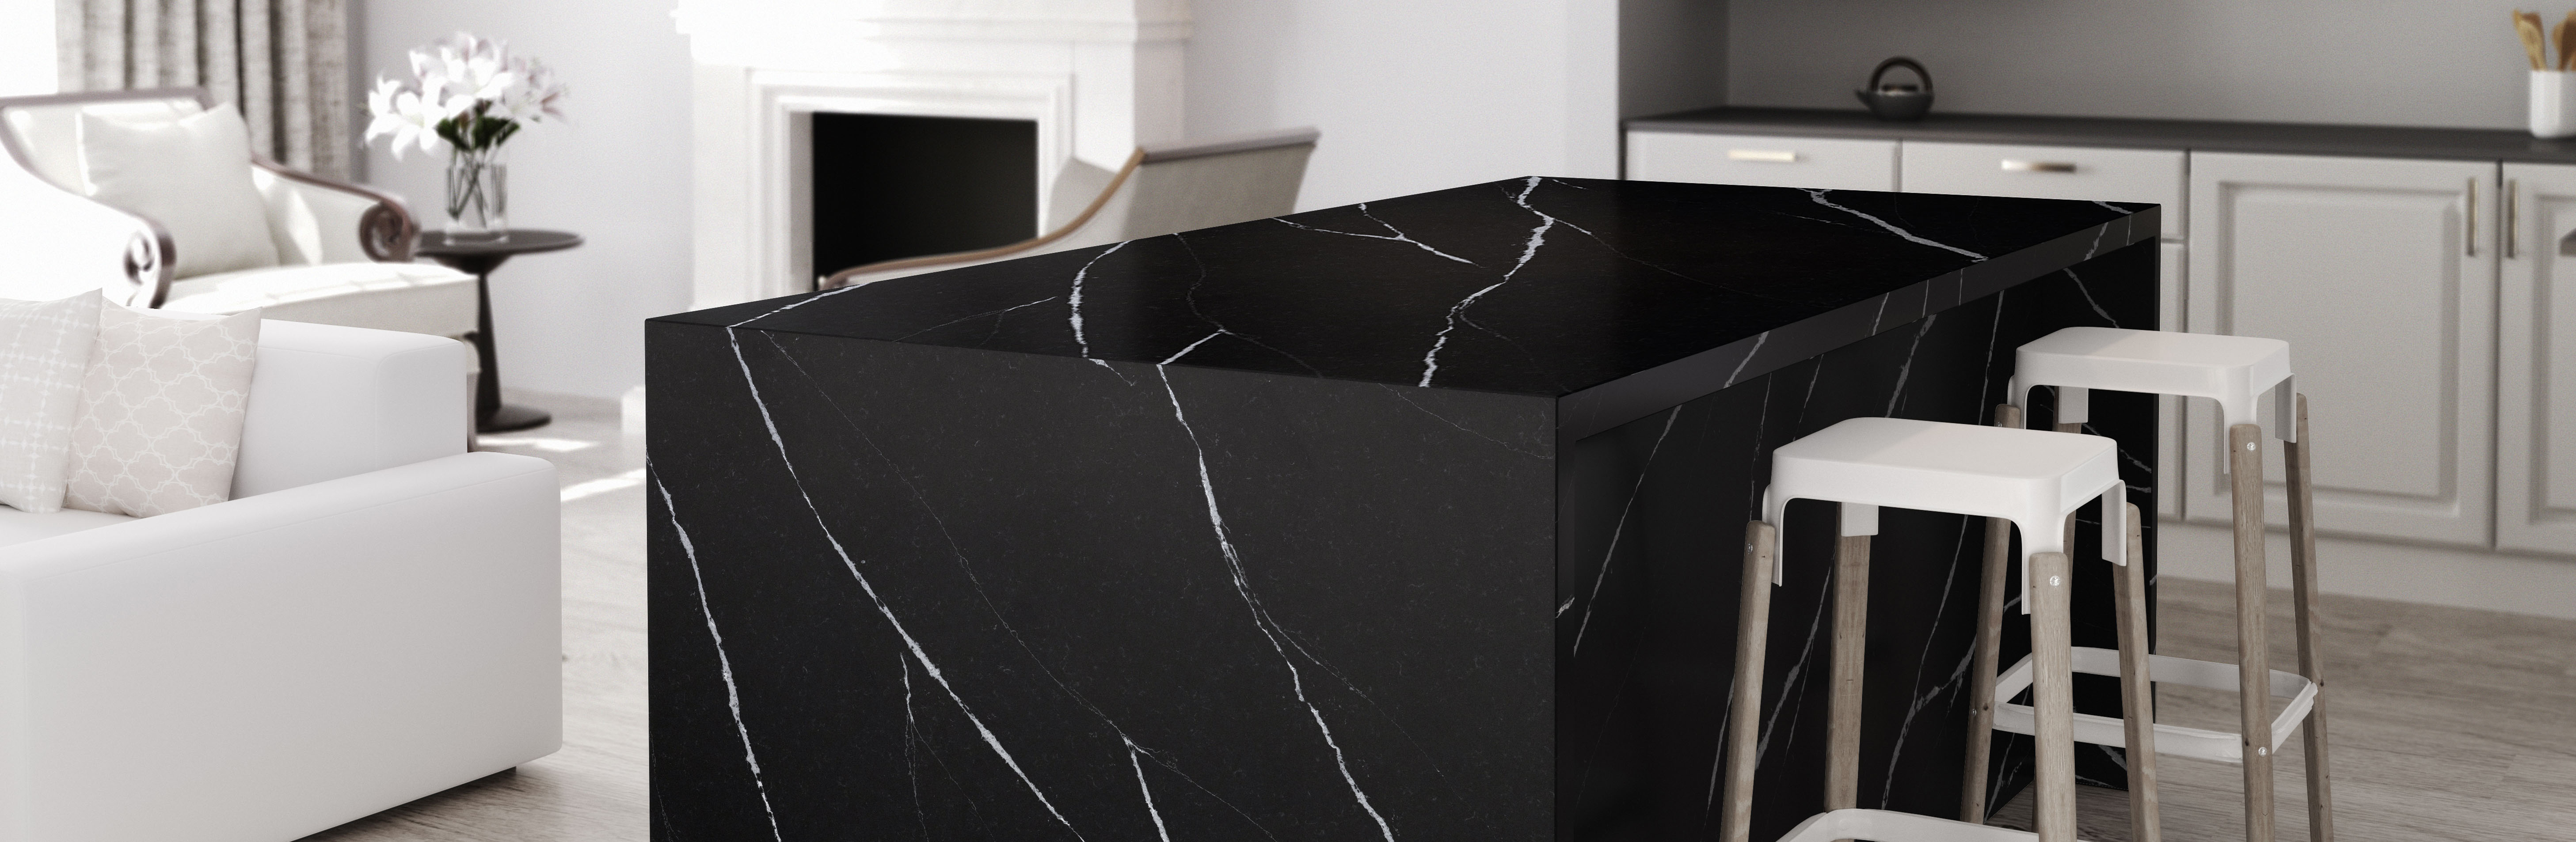 Cocina Kitchen; Dekton Superficies Ultracompactas Ultracompact Surfaces; Encimera Worktop Benchtop Countertop; Encuadre Completo Full Frame; Borea